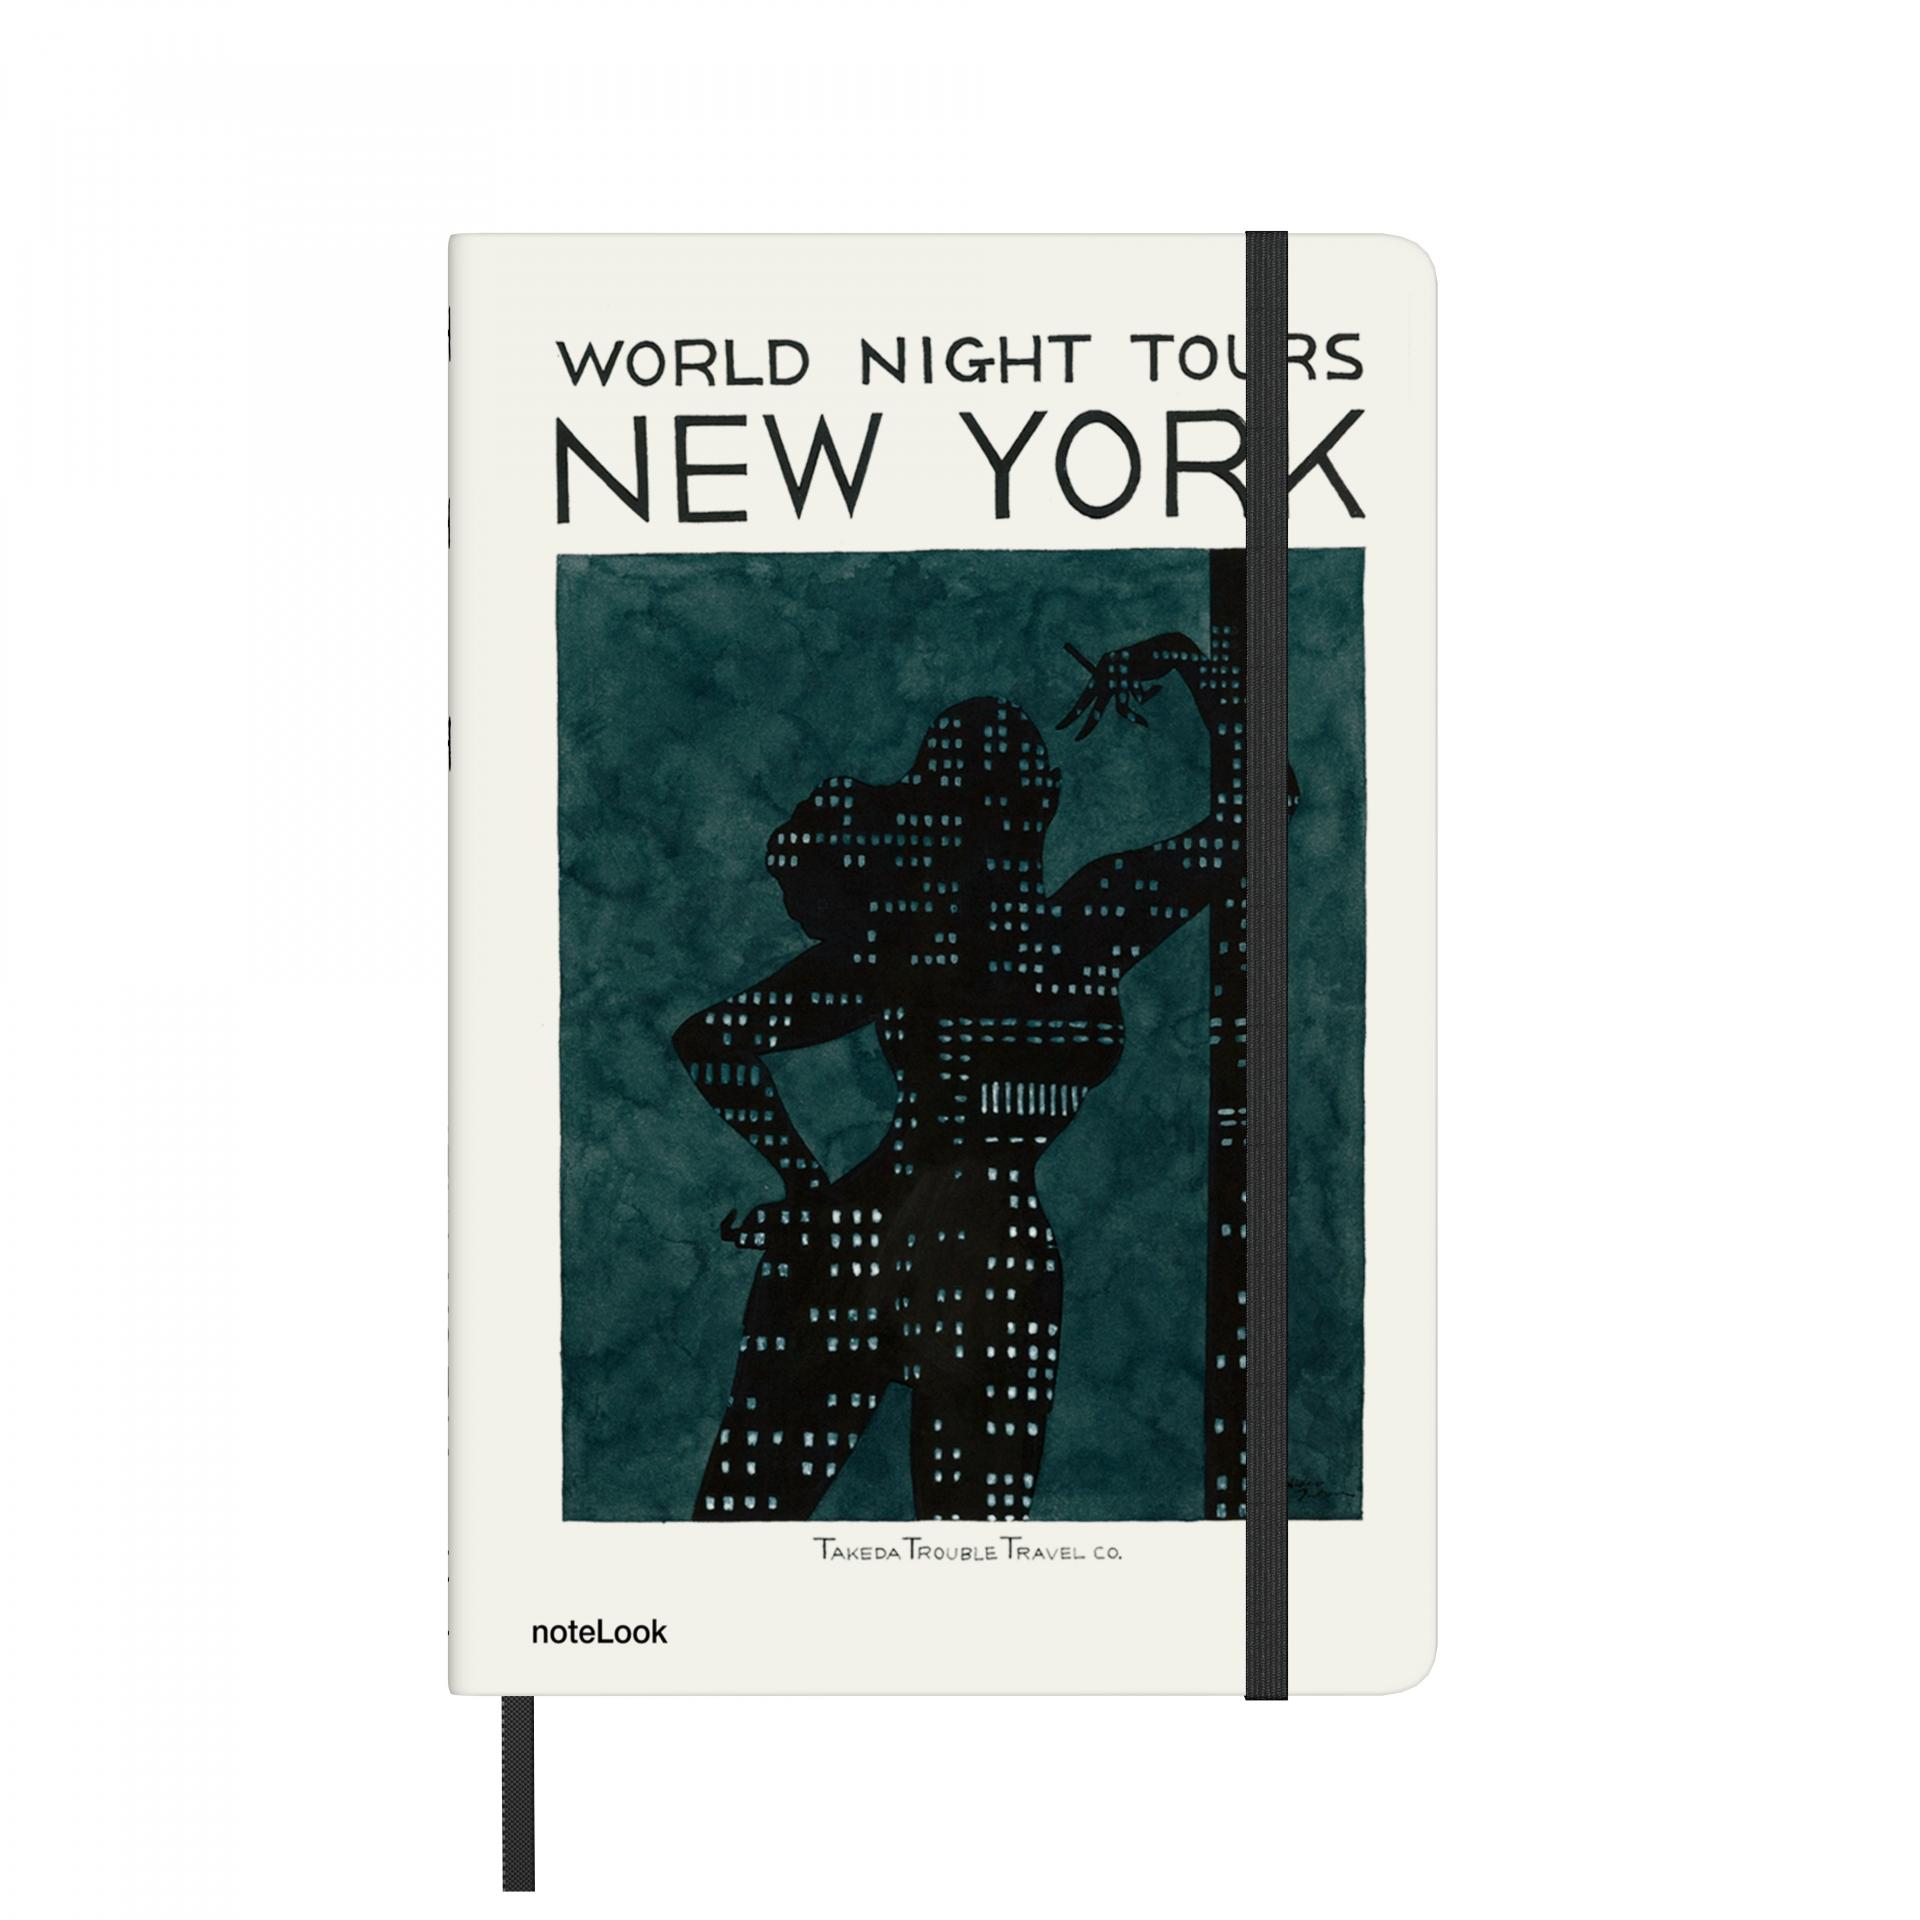 Бележник Scrikss Notelook Notebook Takeda New York Striped, модел 77174,   A5